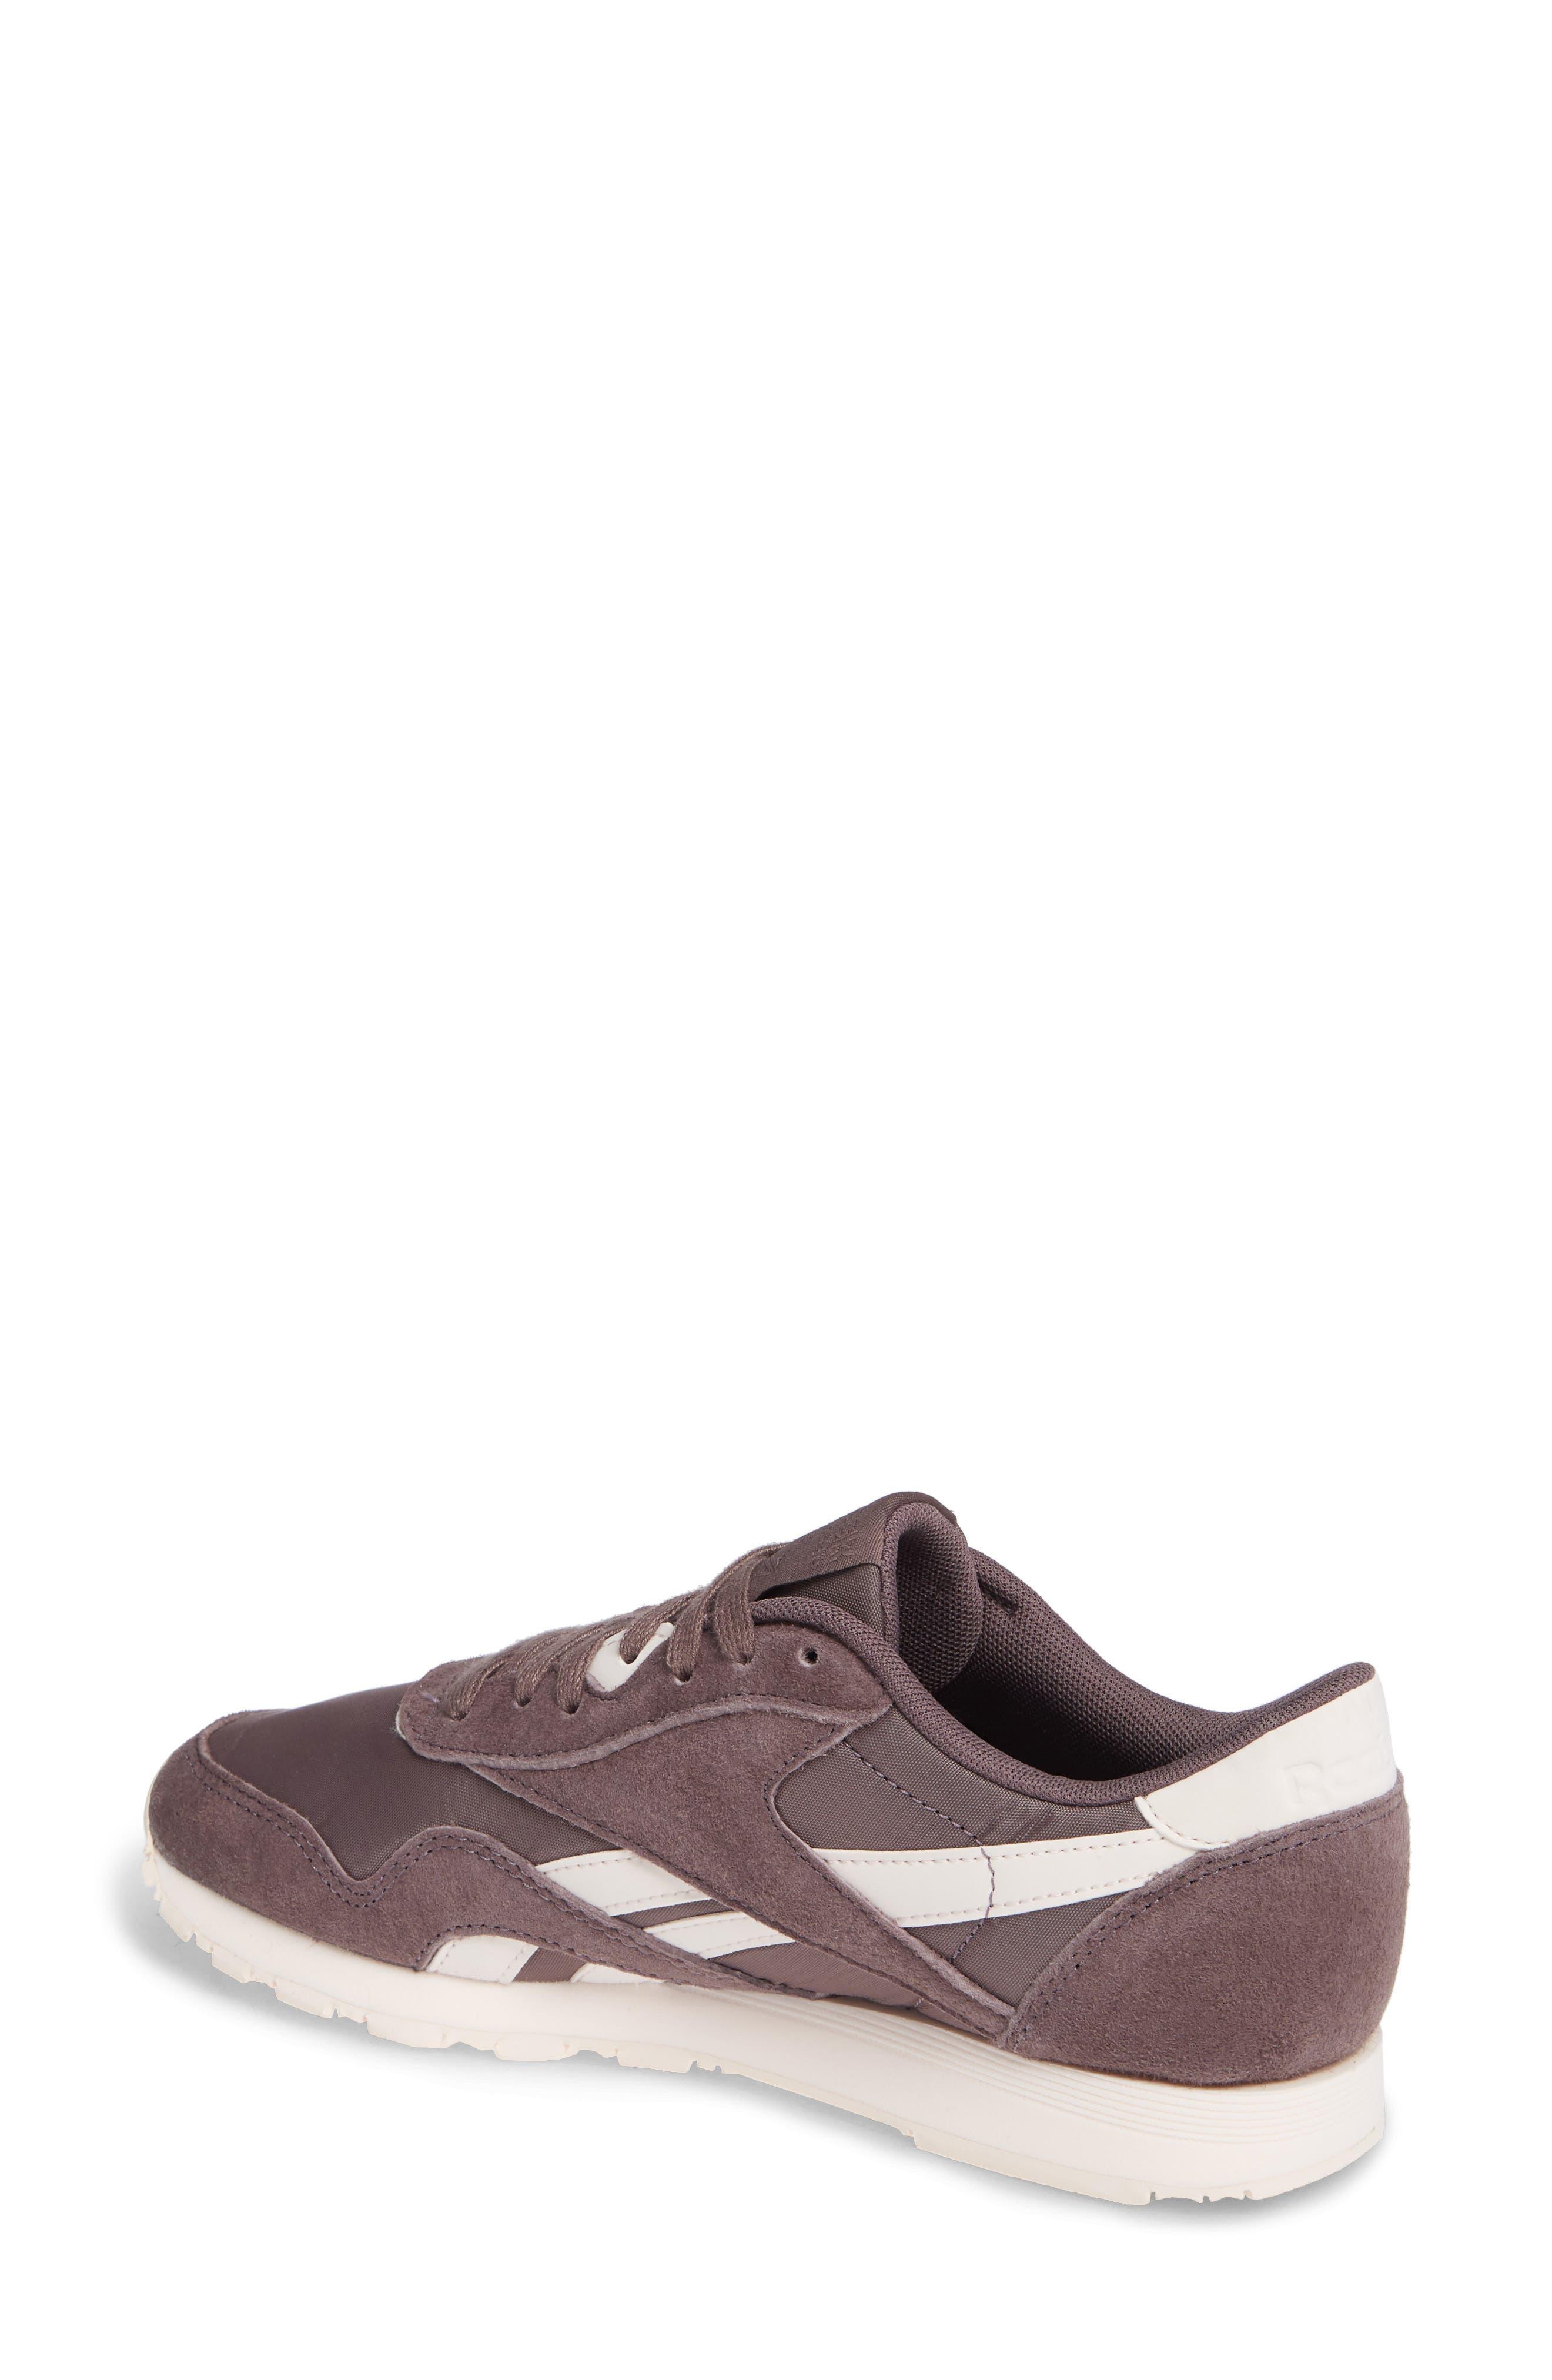 Classic Sneaker,                             Alternate thumbnail 2, color,                             020